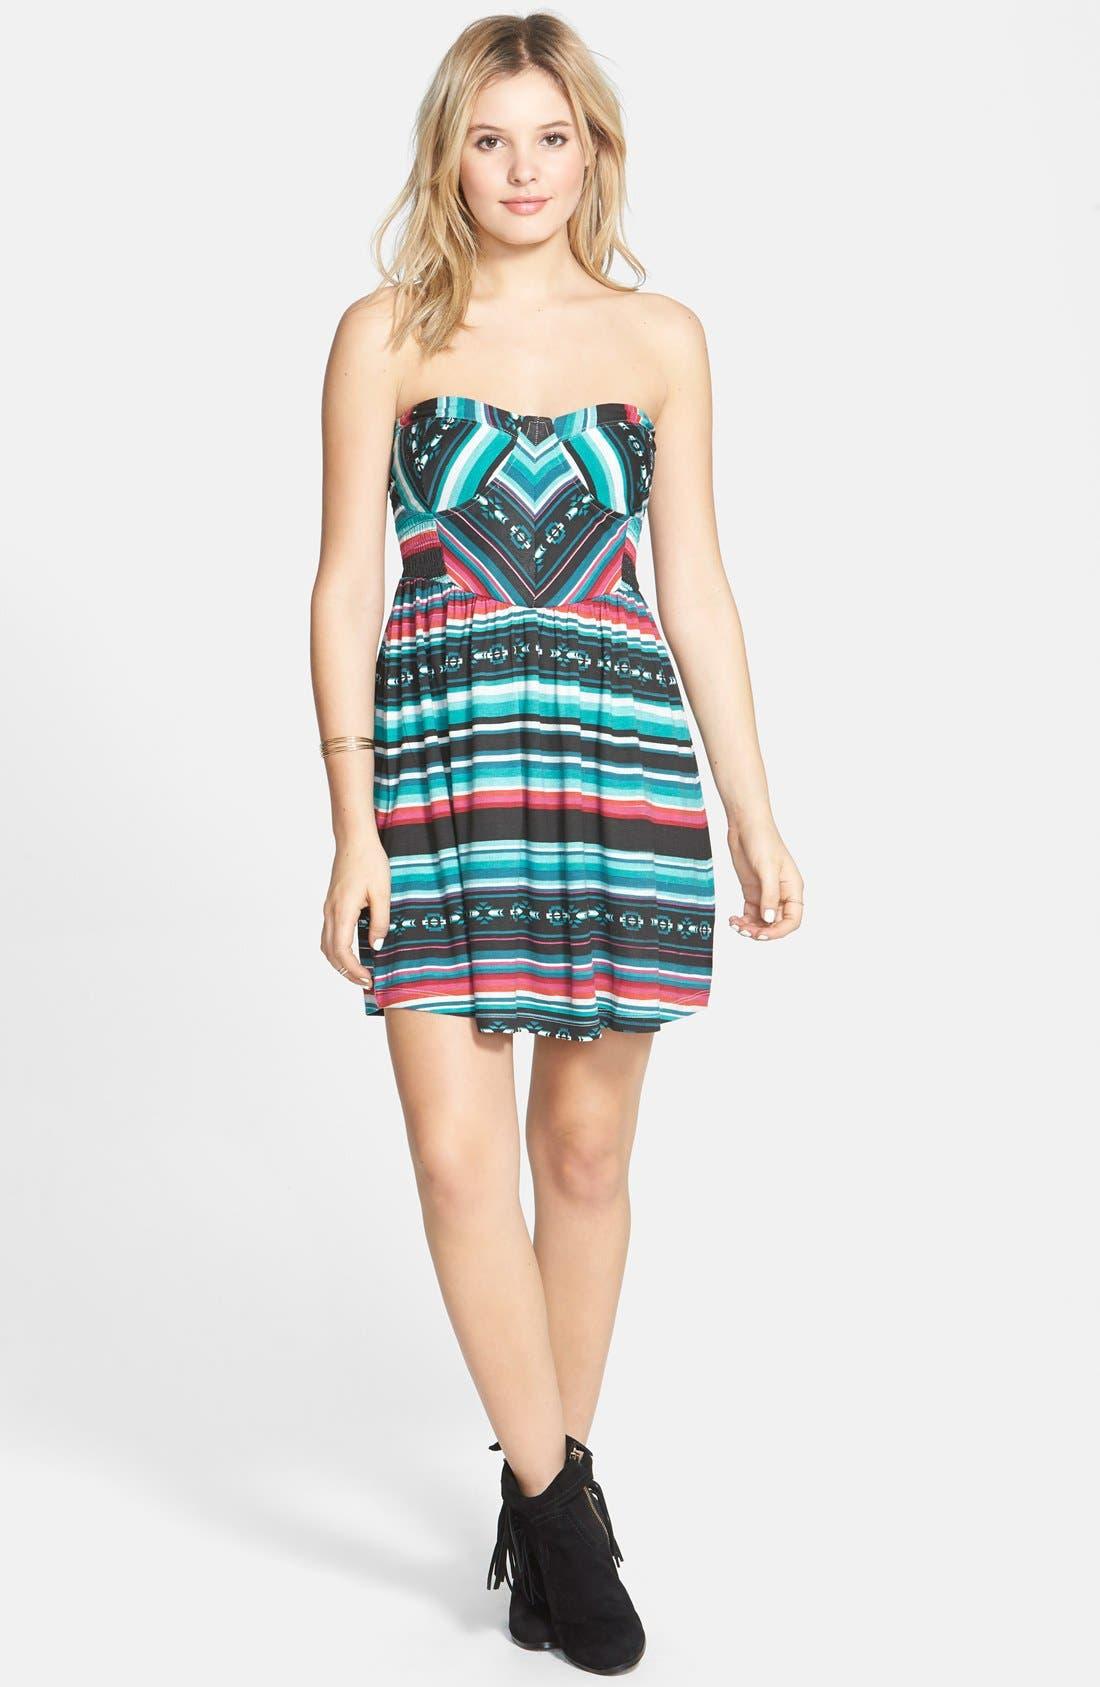 Alternate Image 1 Selected - Billabong 'Spread the News' Print Strapless Dress (Juniors)